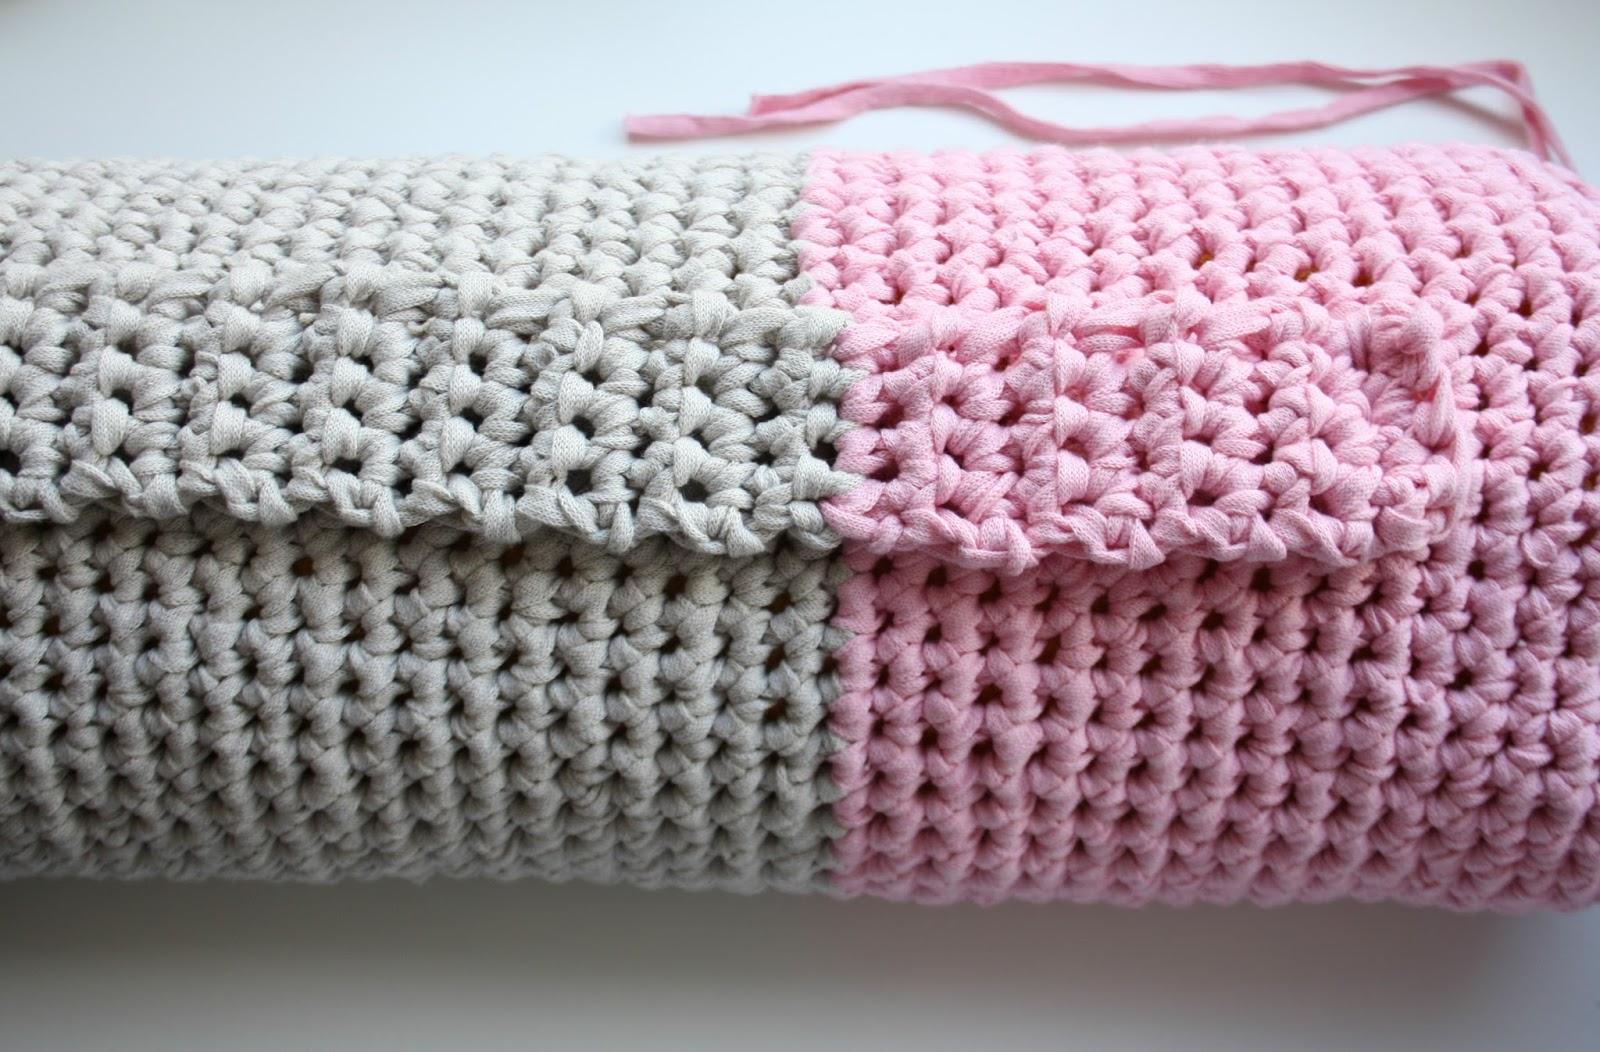 Famoso Yoga Mat Bag Knitting Pattern Molde - Manta de Tejer Patrón ...